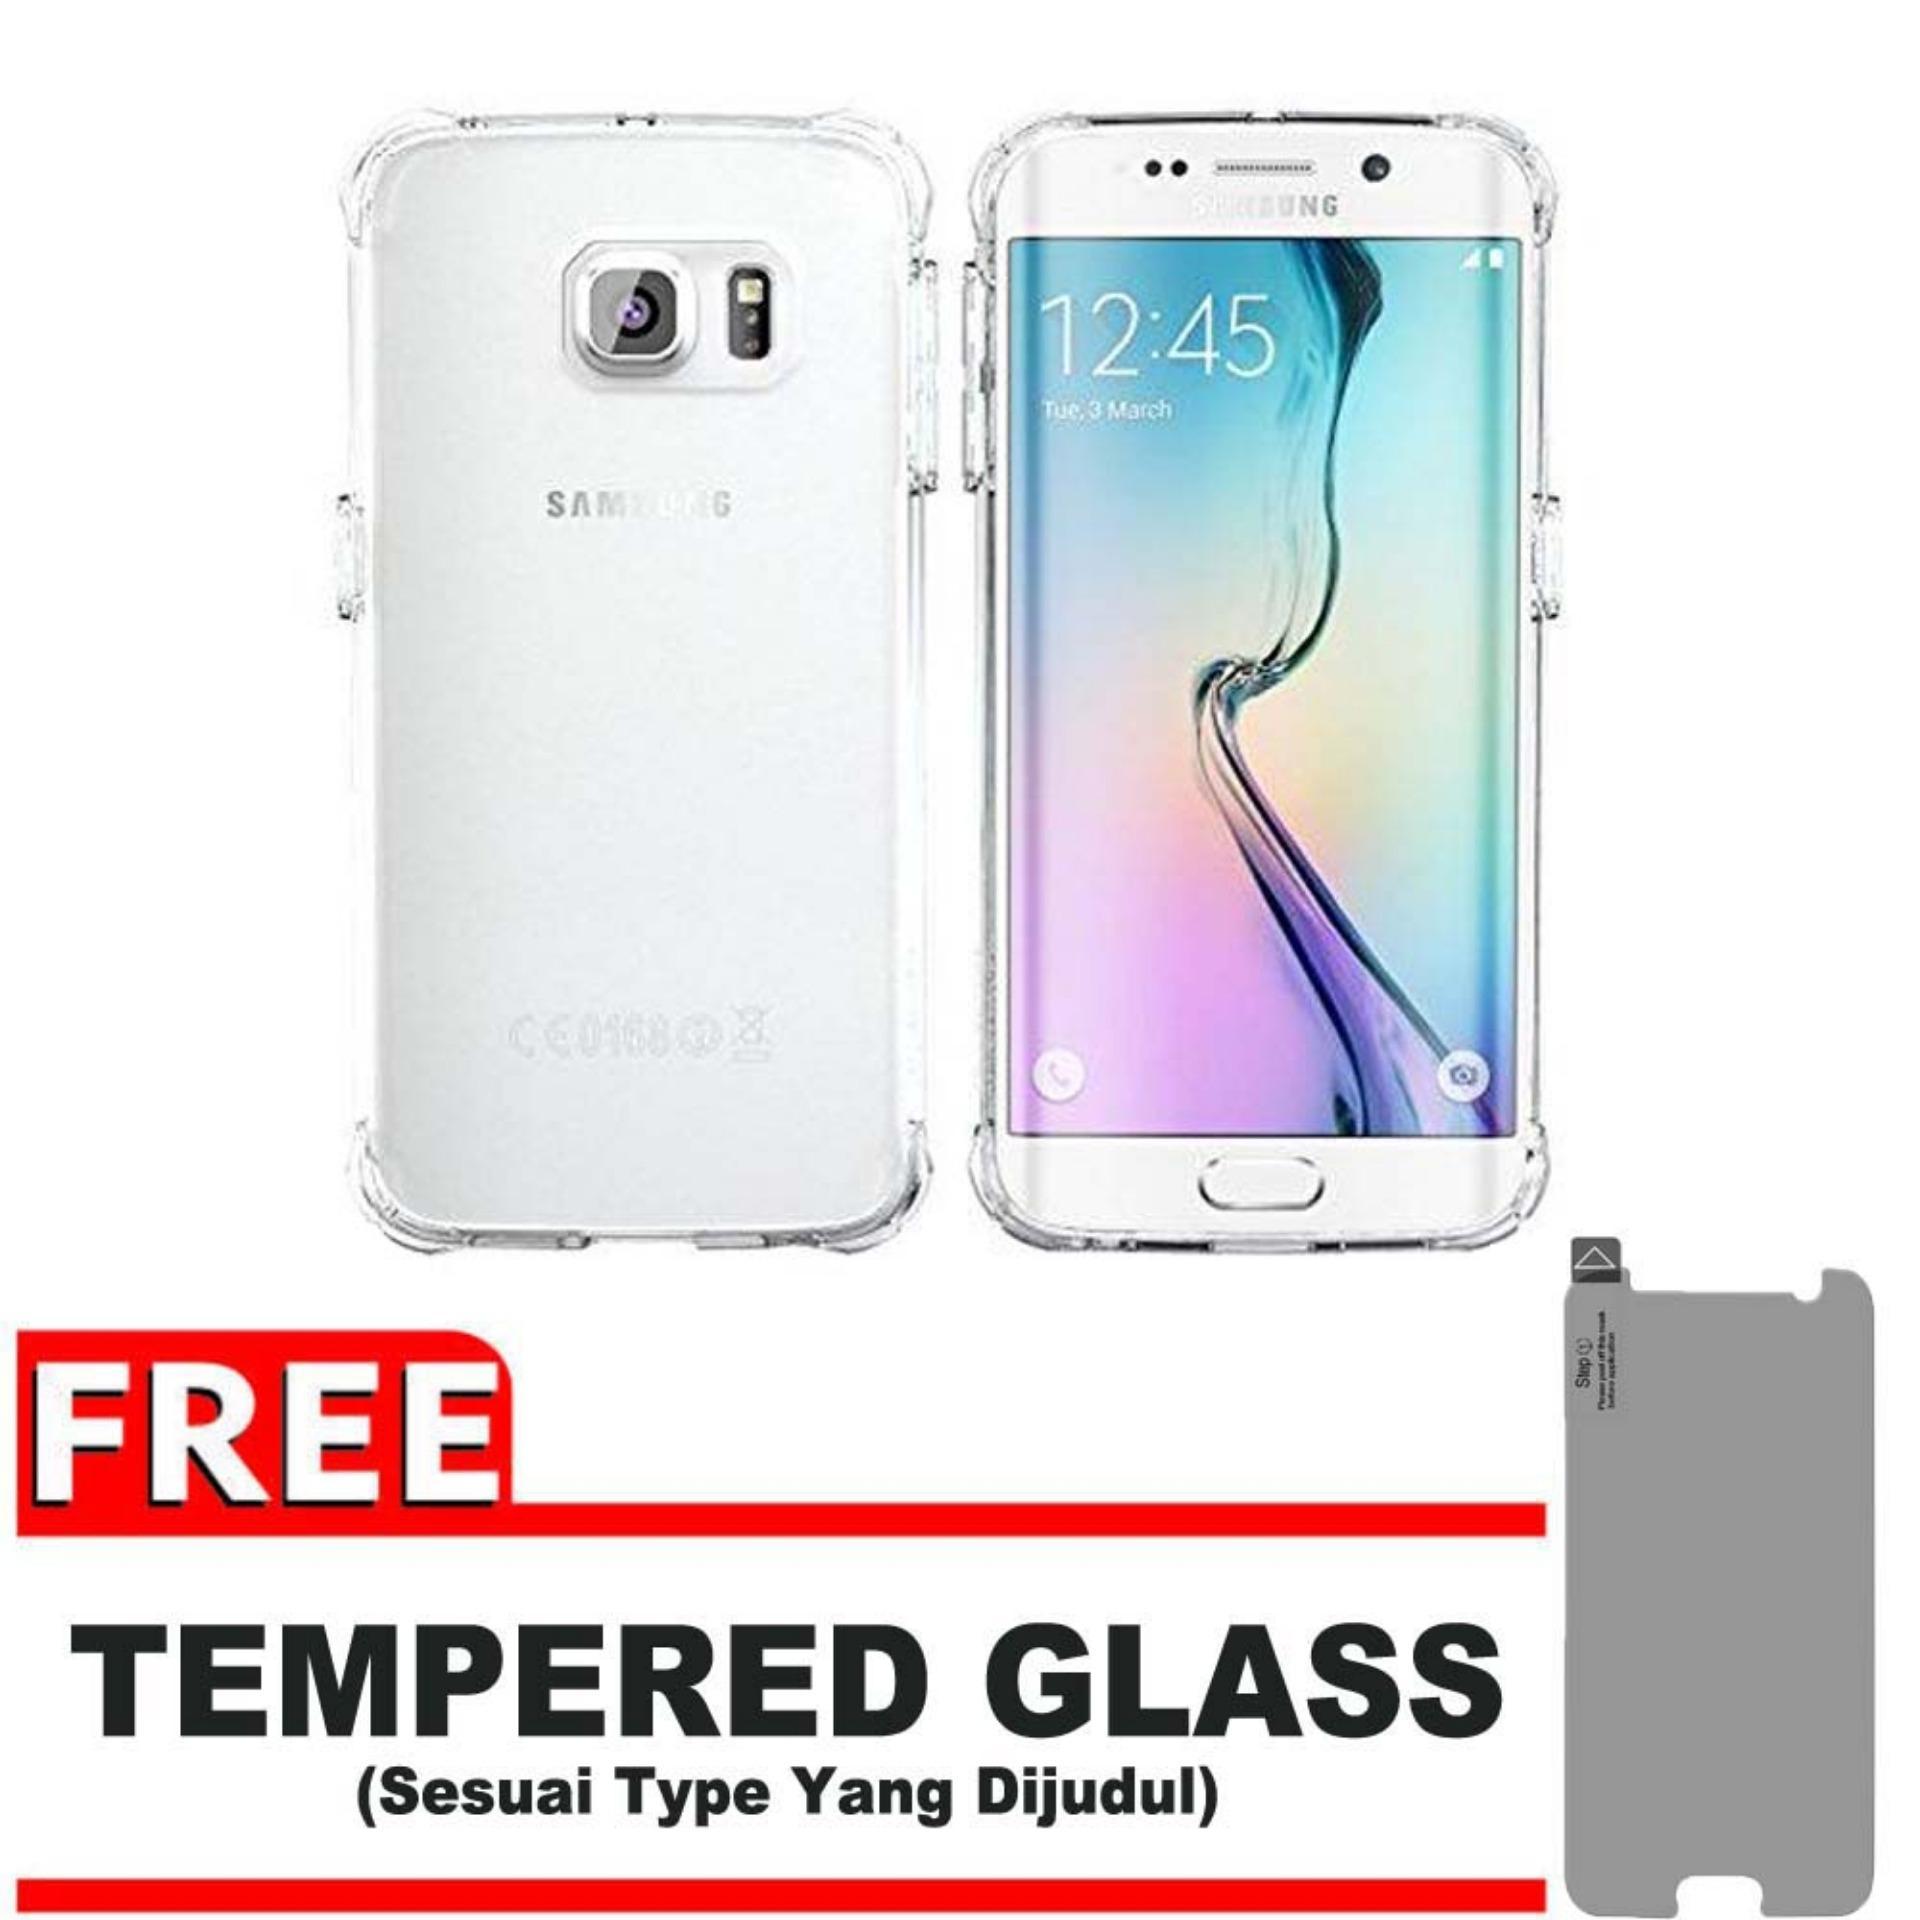 Cek Harga Baru Tpu Edge Samsung Galaxy Note 5 N920 Duos Lte Anti Gores Shock Screen Protector S7 Full Depanbelakang Shockcase For S6 G925 4g Premium